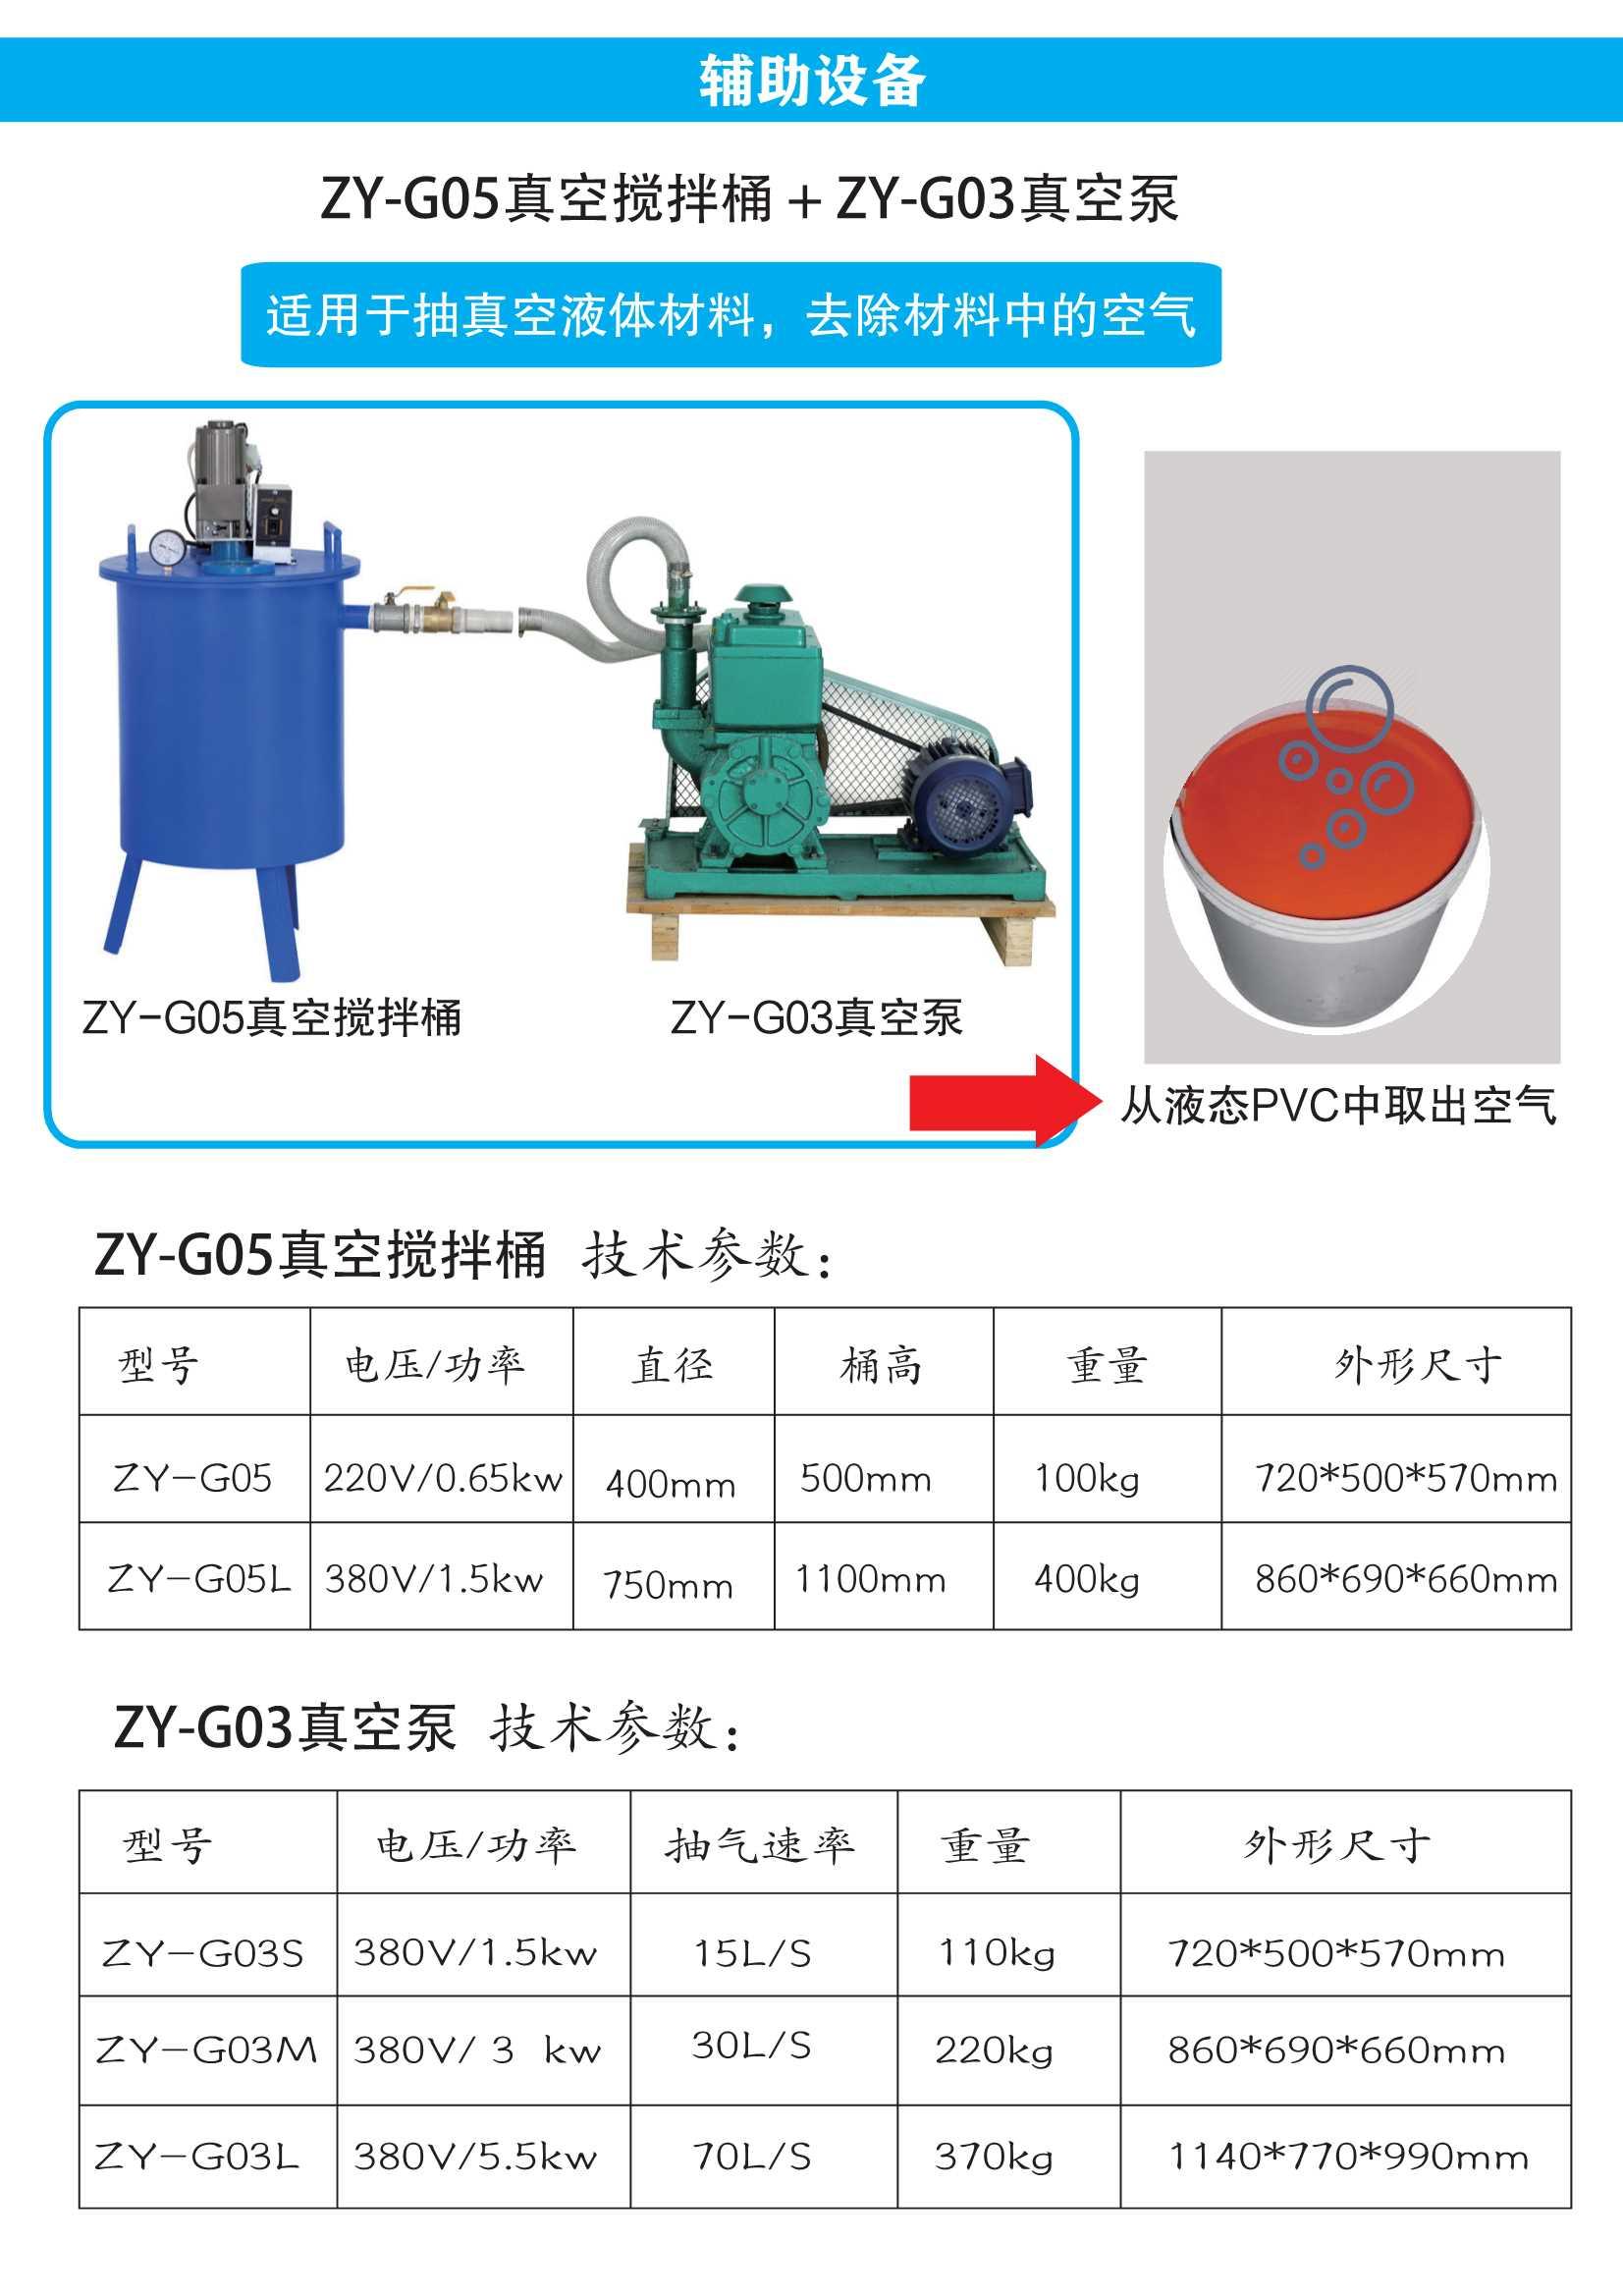 PVC点胶烘烤生产线设备